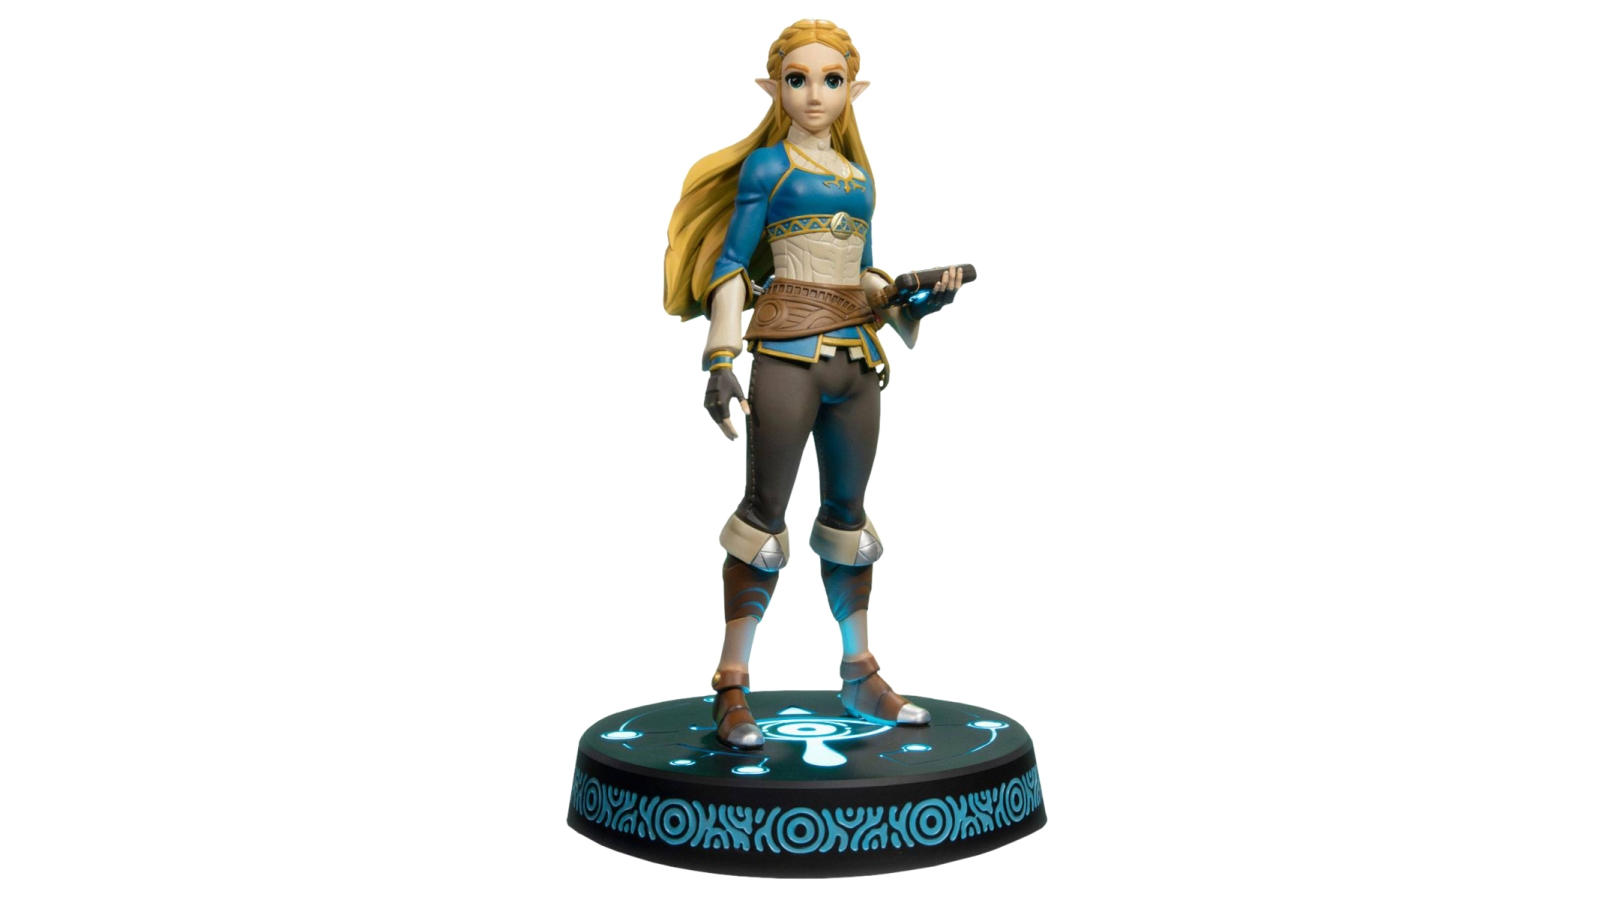 Zelda - Breath of the Wild - פסלון אספנות 10 אינץ' - Collector's Edition